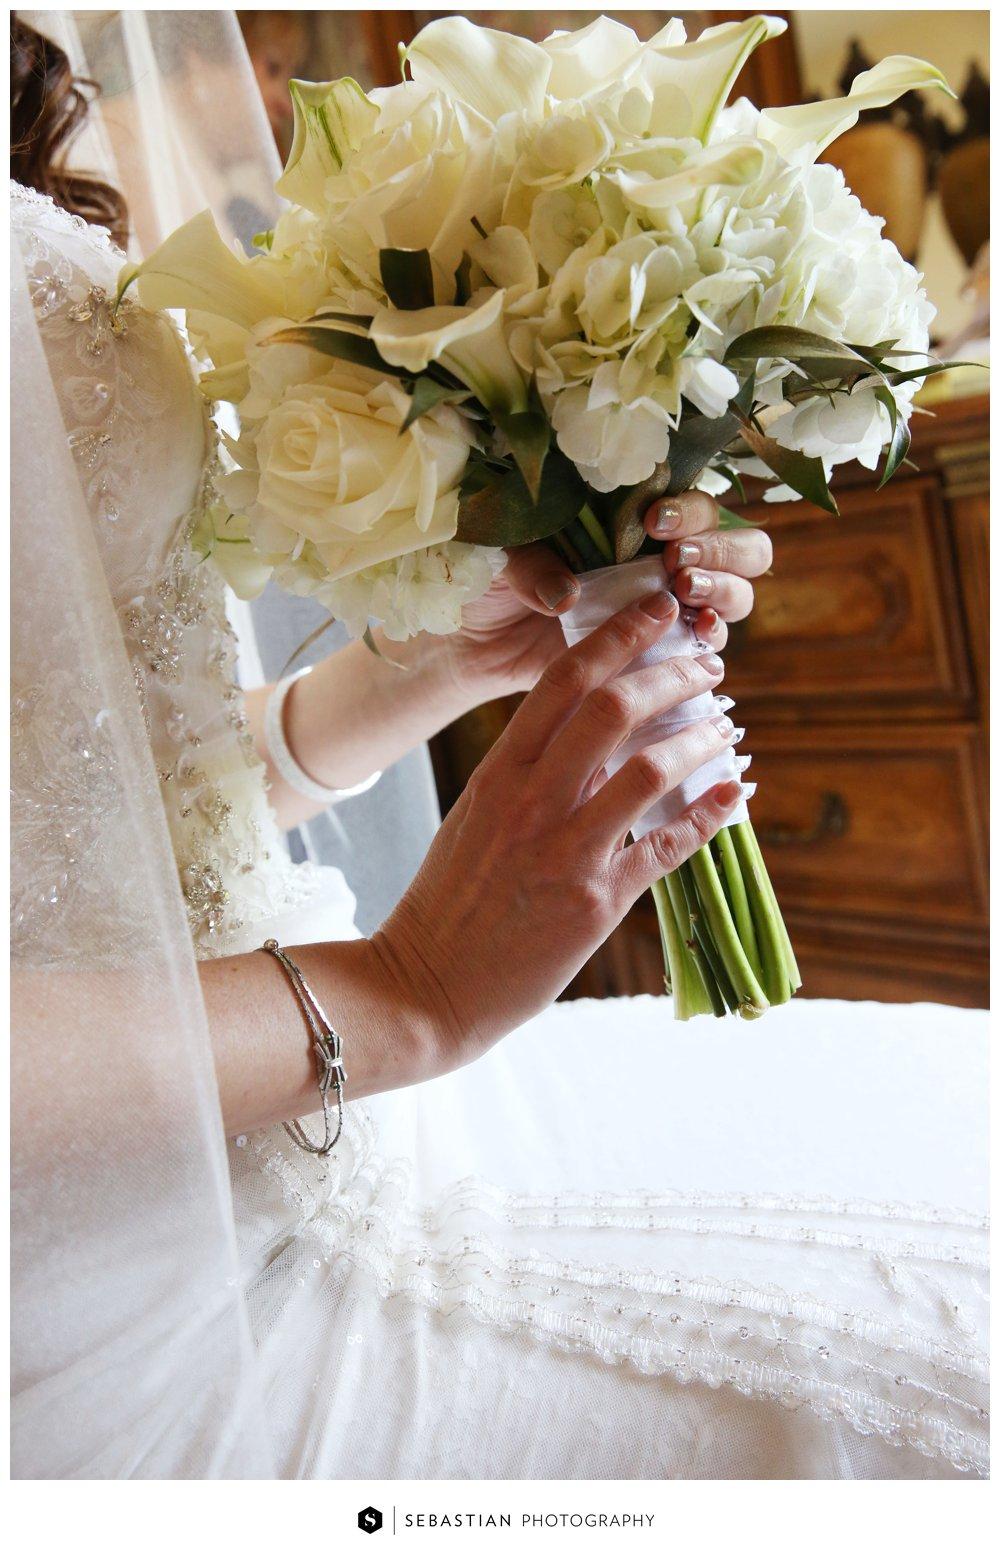 Sebastian Photography_CT Wedding Photographer_Water's Edge_Costal Wedding_CT Shoreline Wedding_7010.jpg